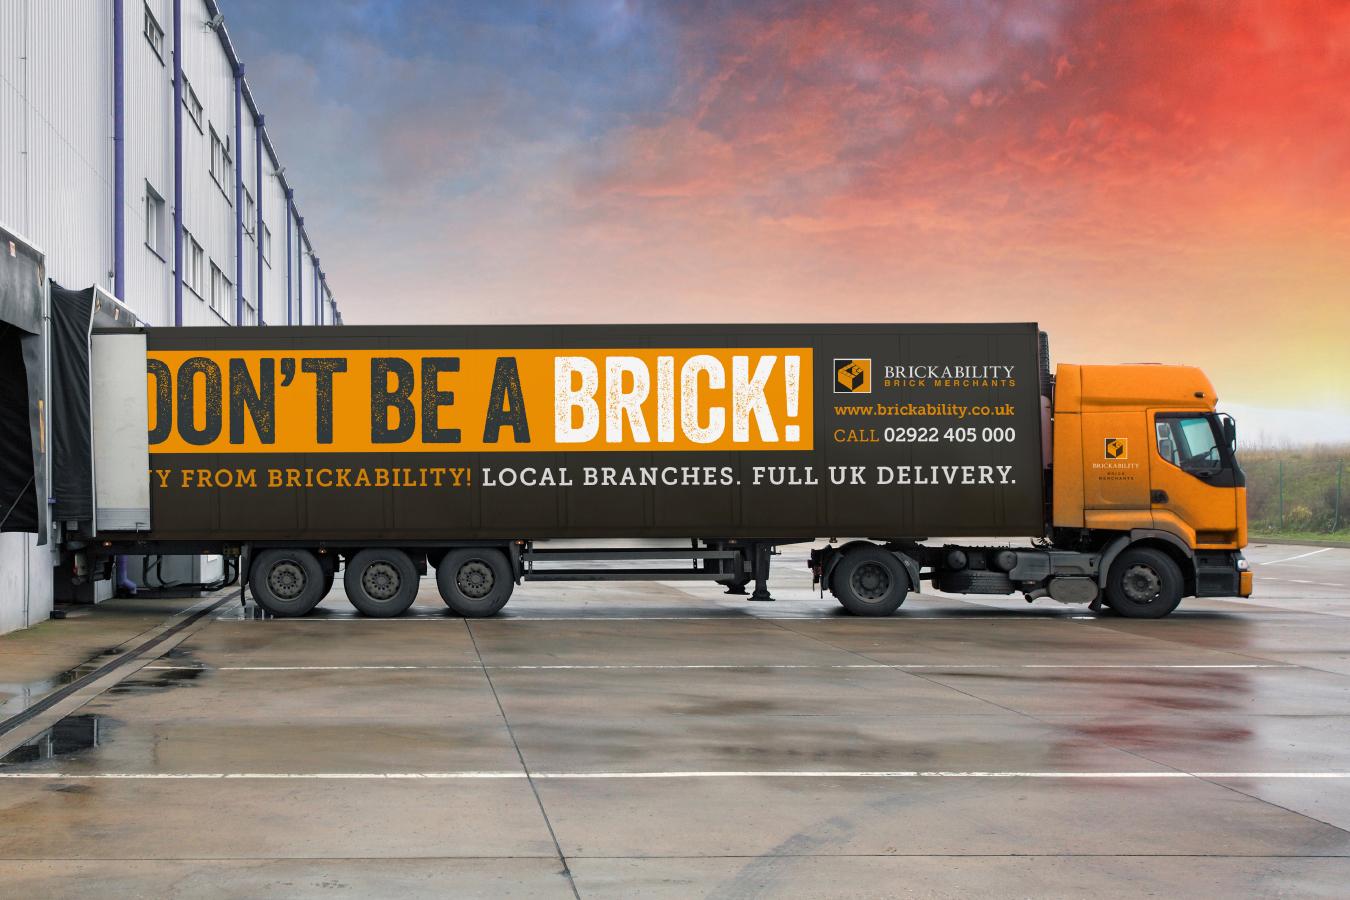 brickability truck.jpg